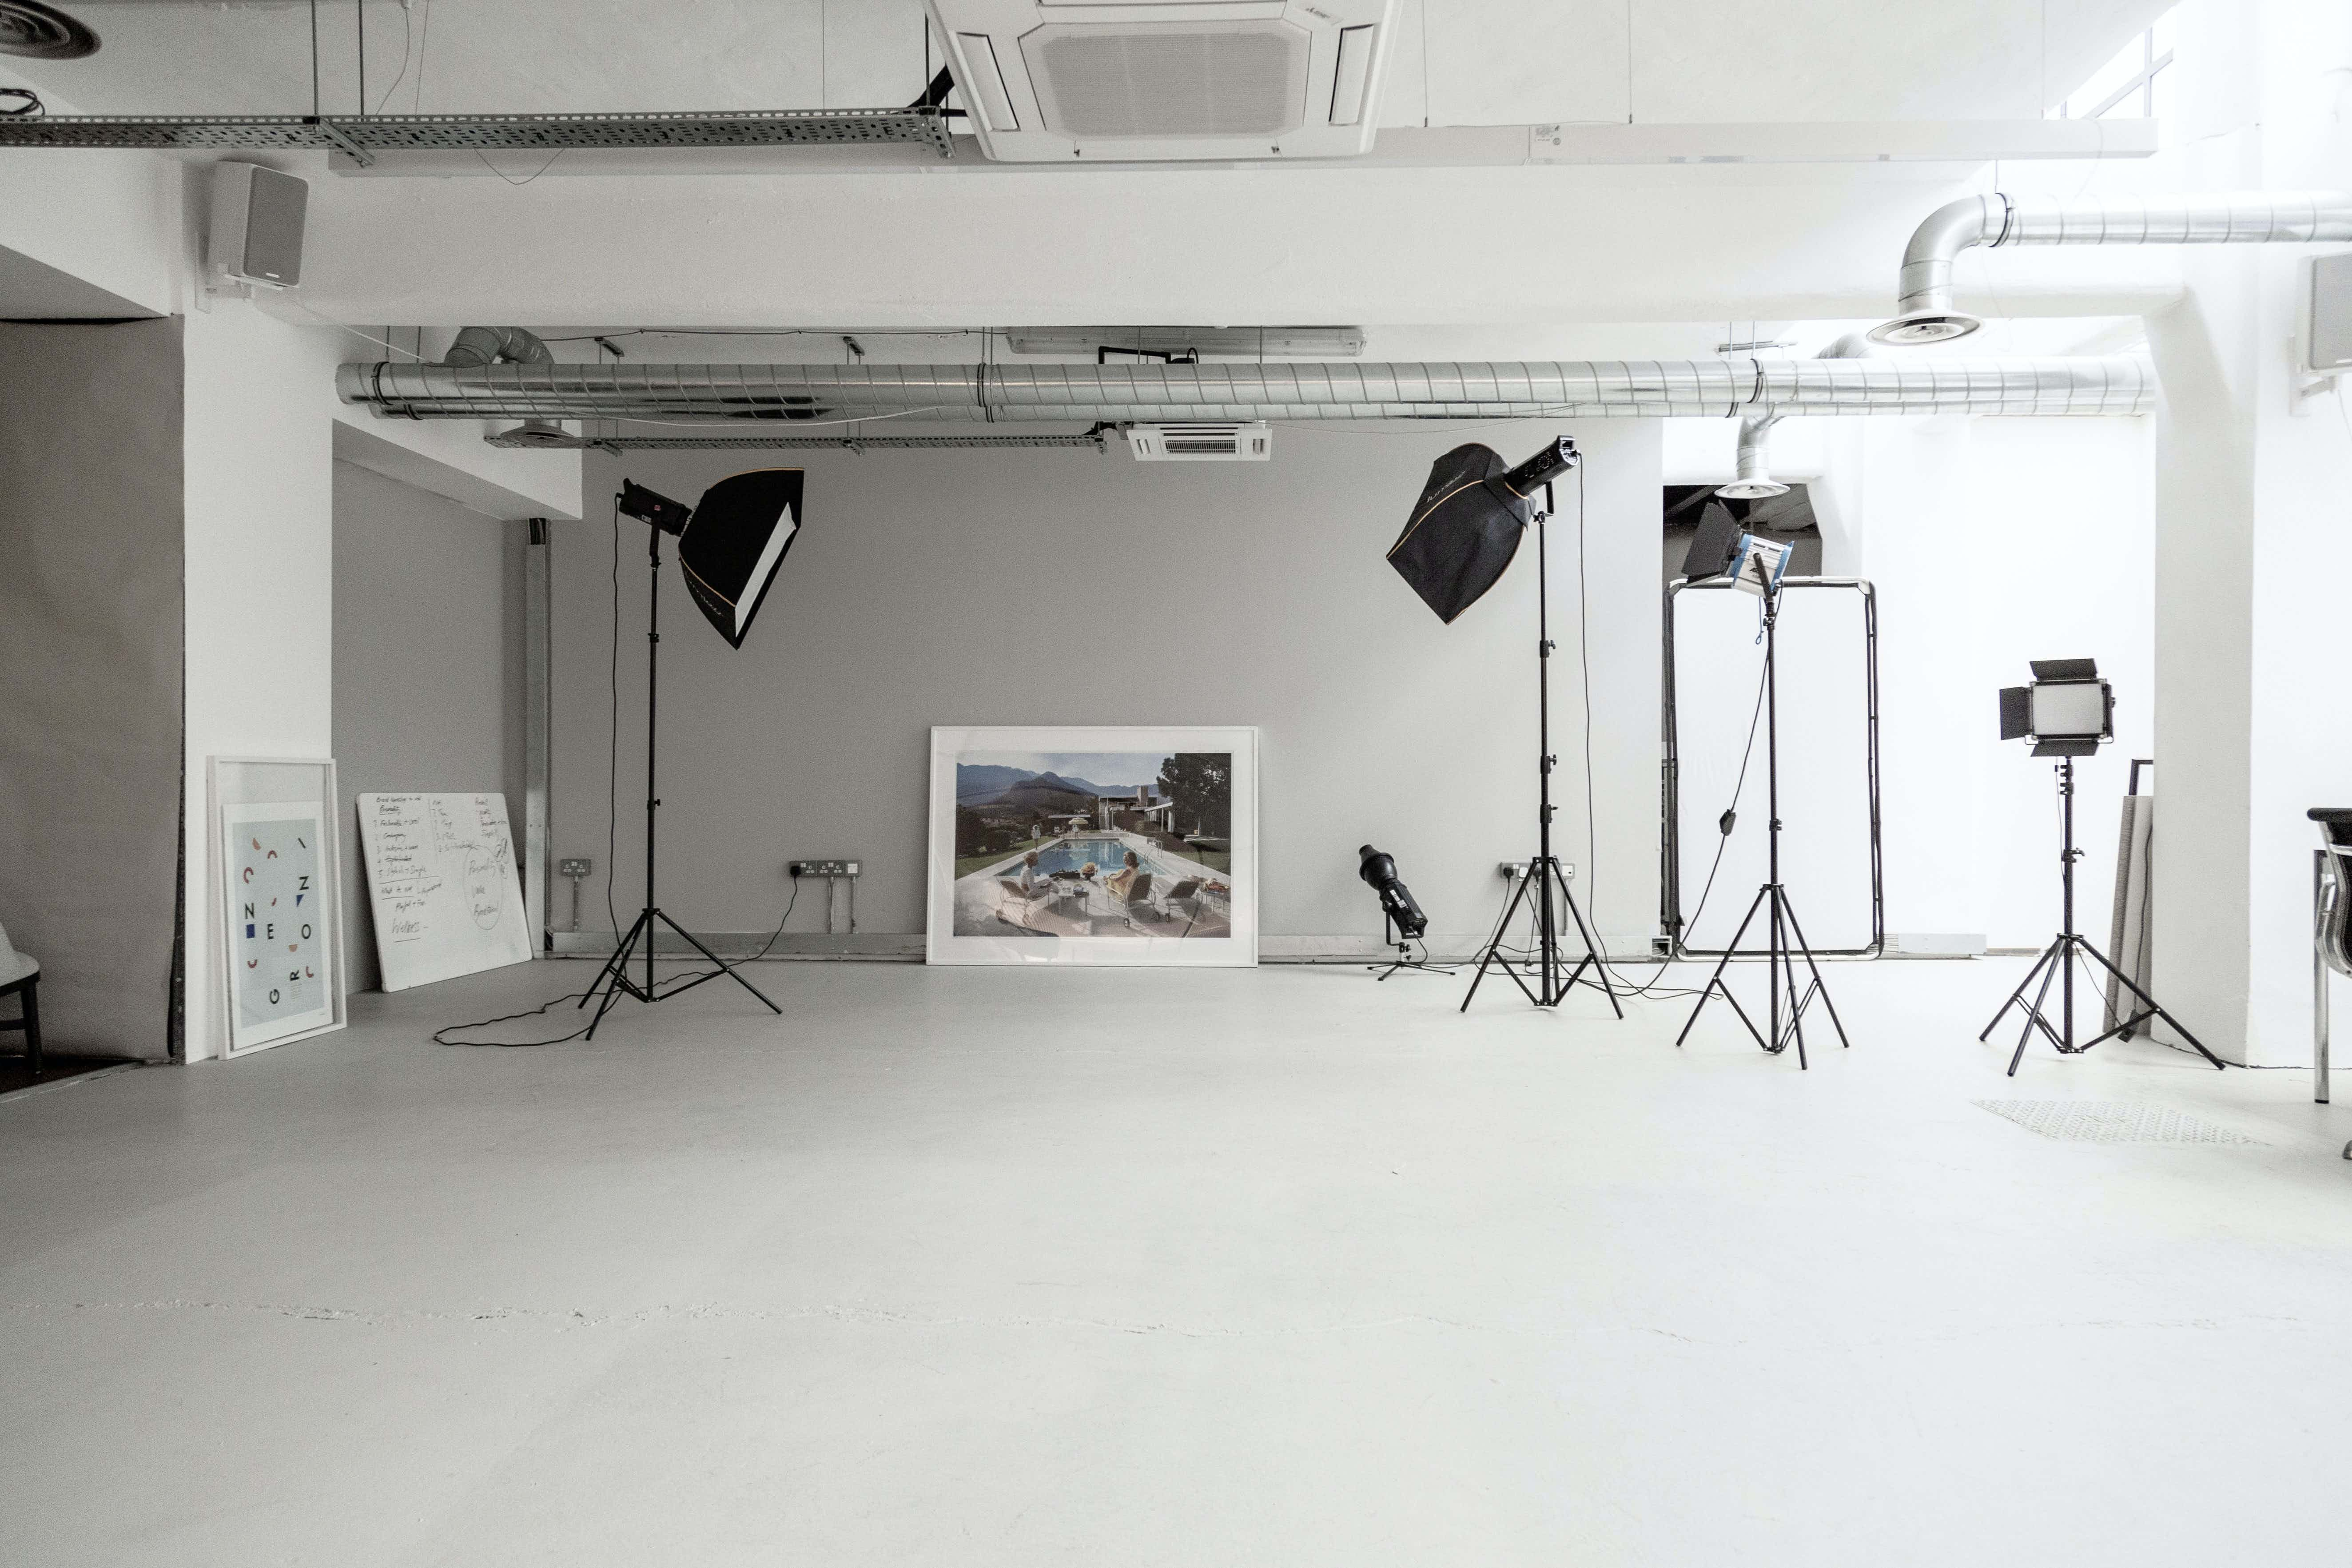 Industrial Creative Studio, The Textile Building